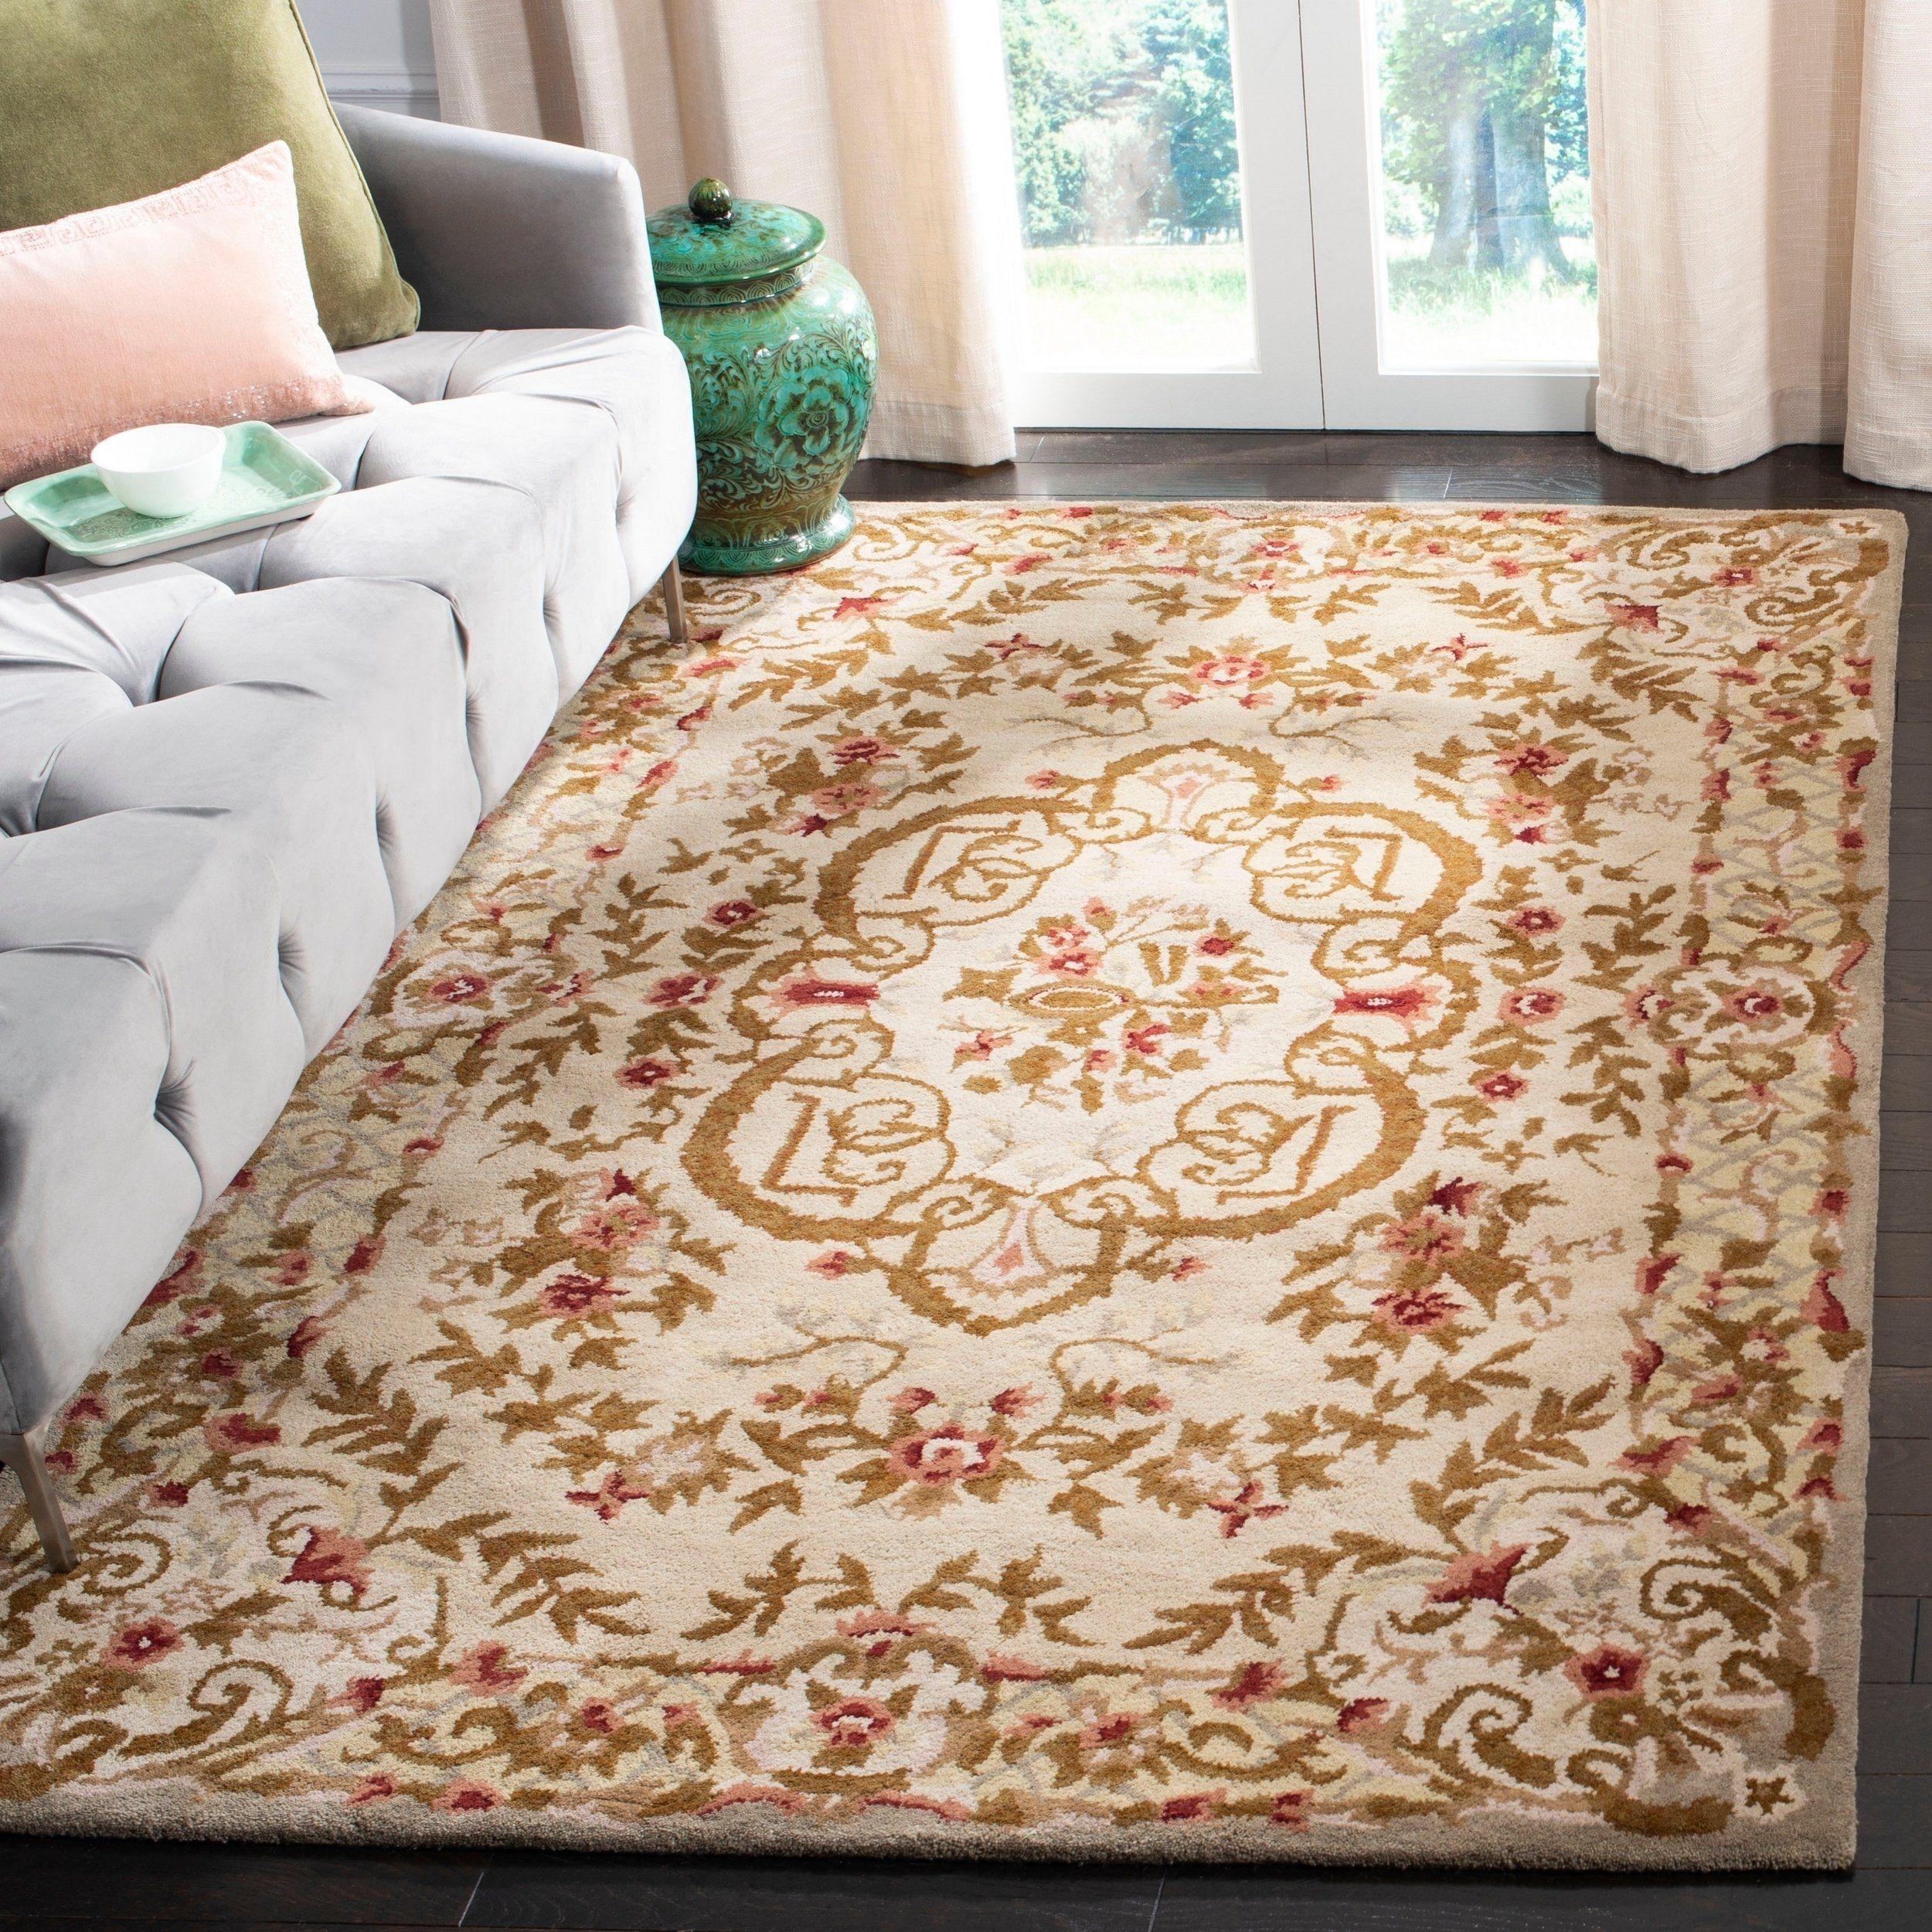 size 5 x 8 safavieh handmade classic ivory wool area rug 5 x 8 rh pinterest com